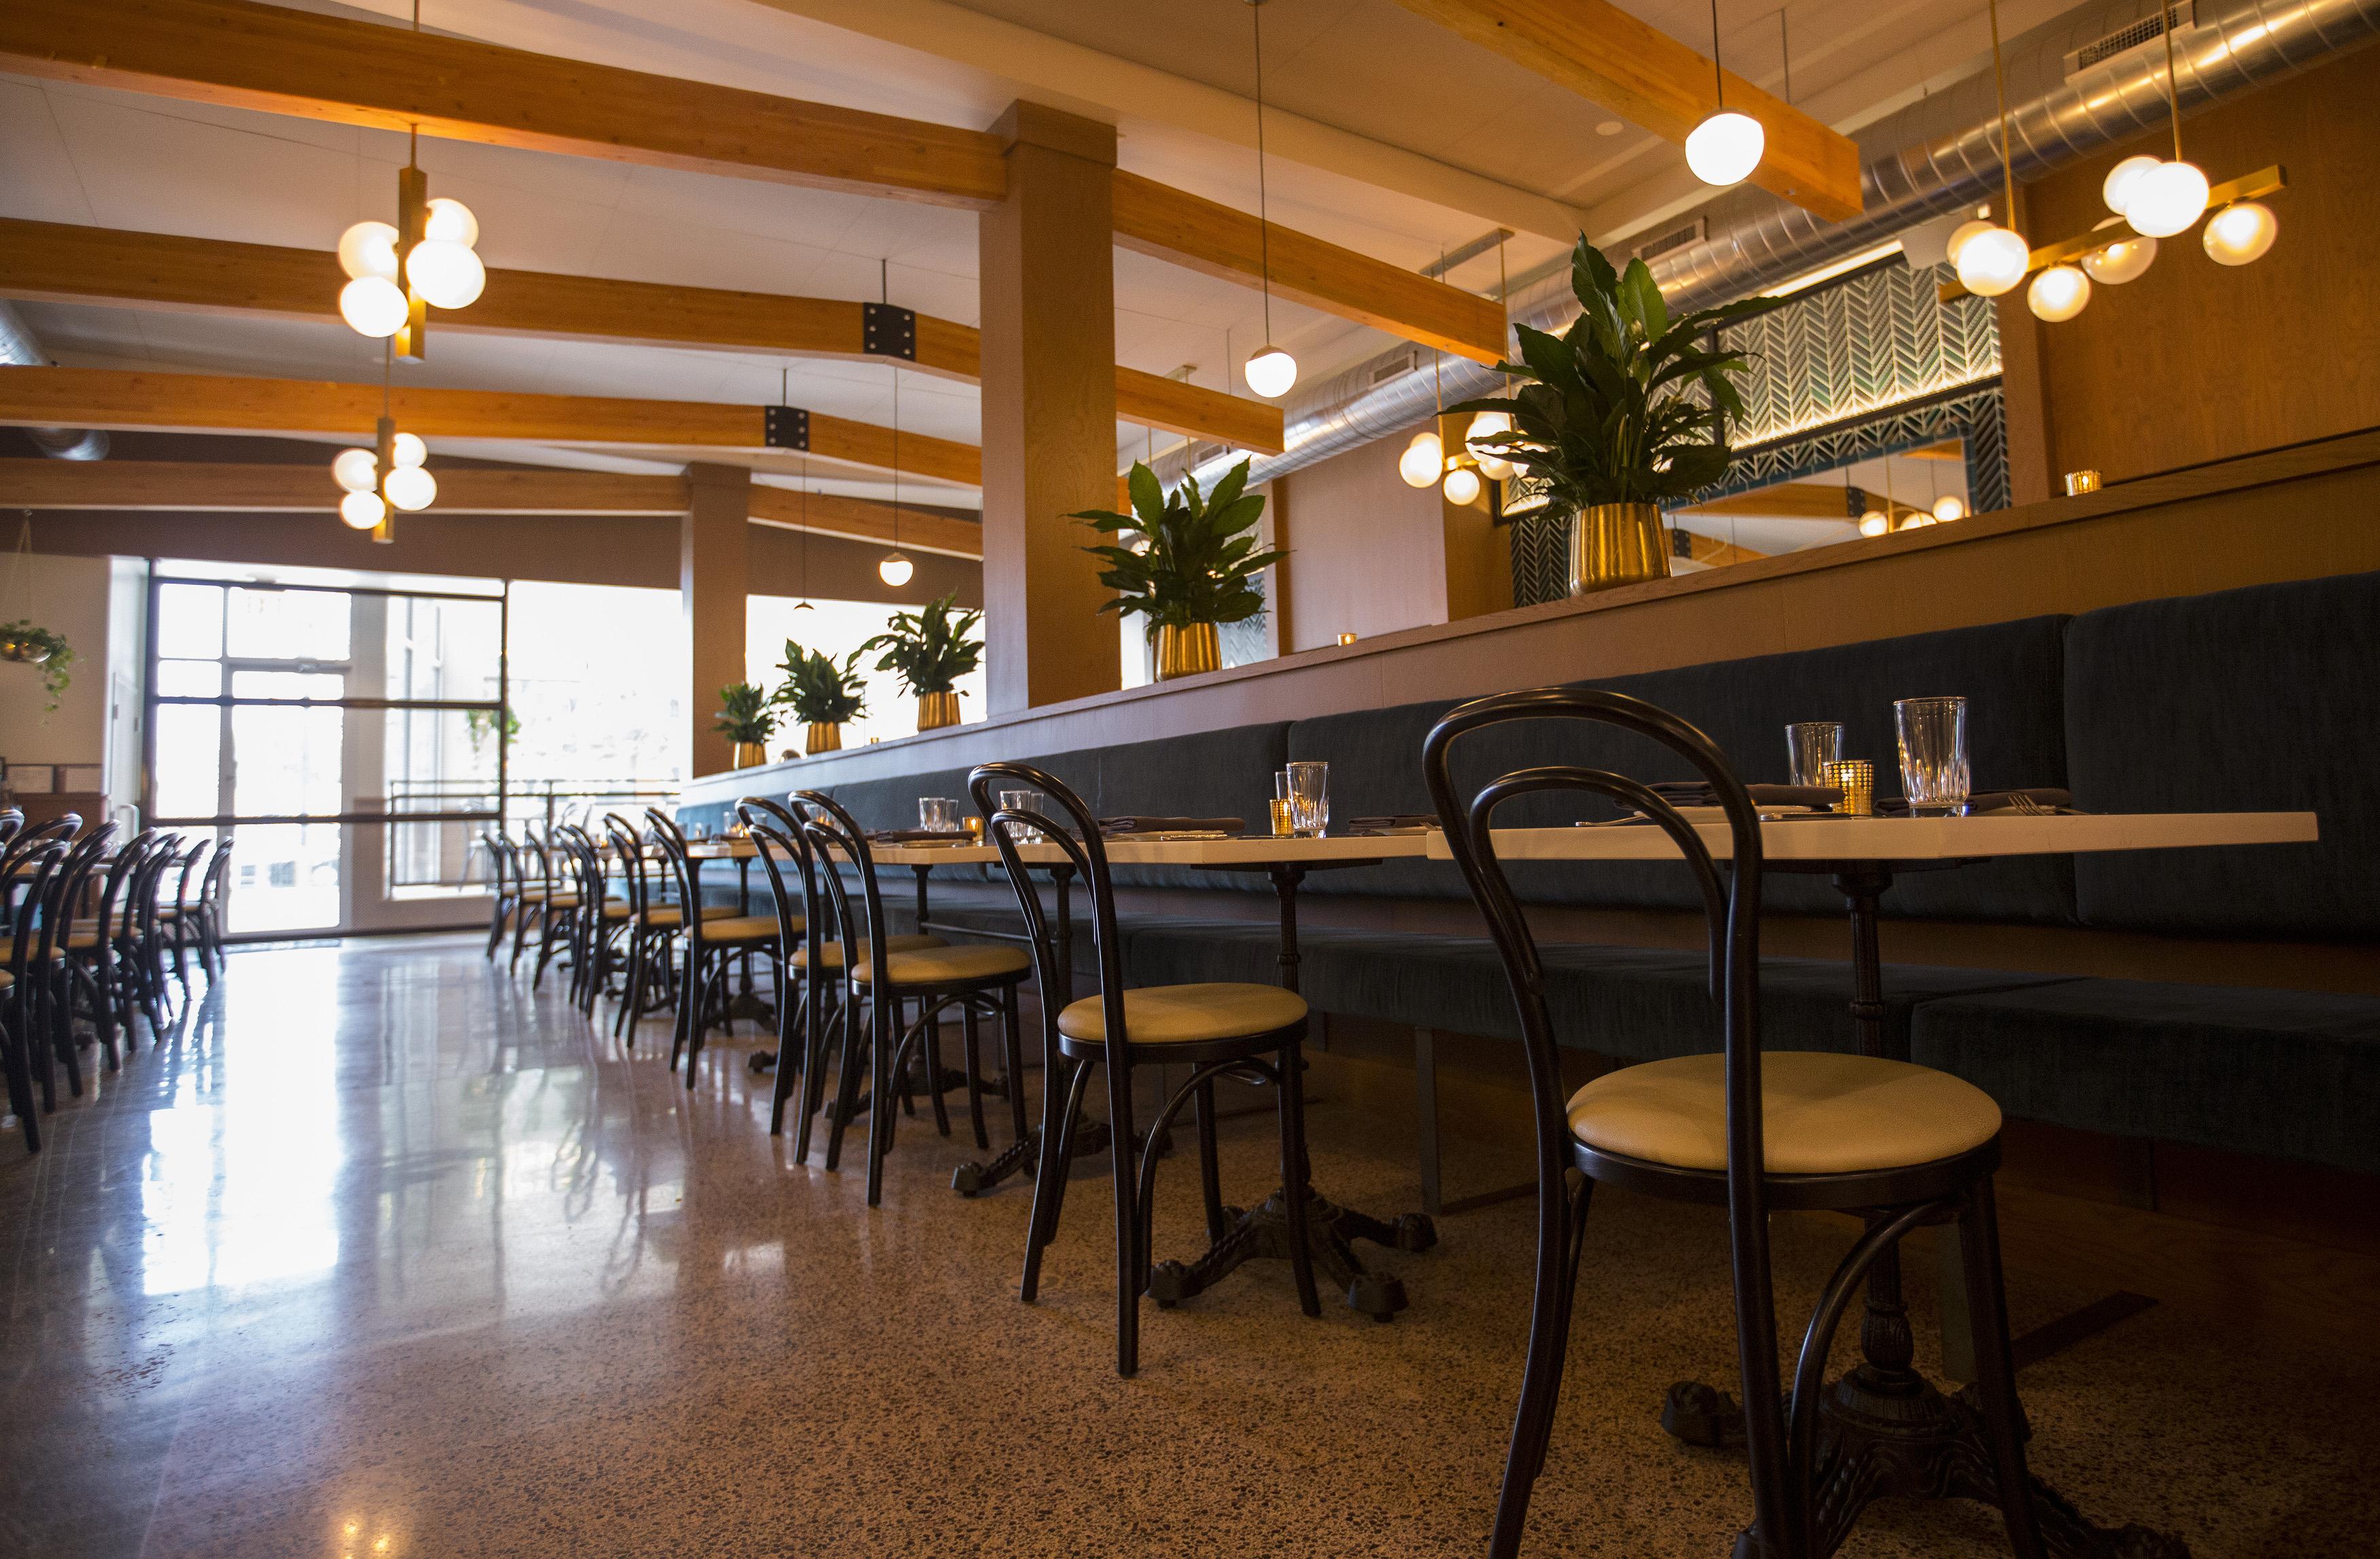 A low-level shot of a restaurant's bar.